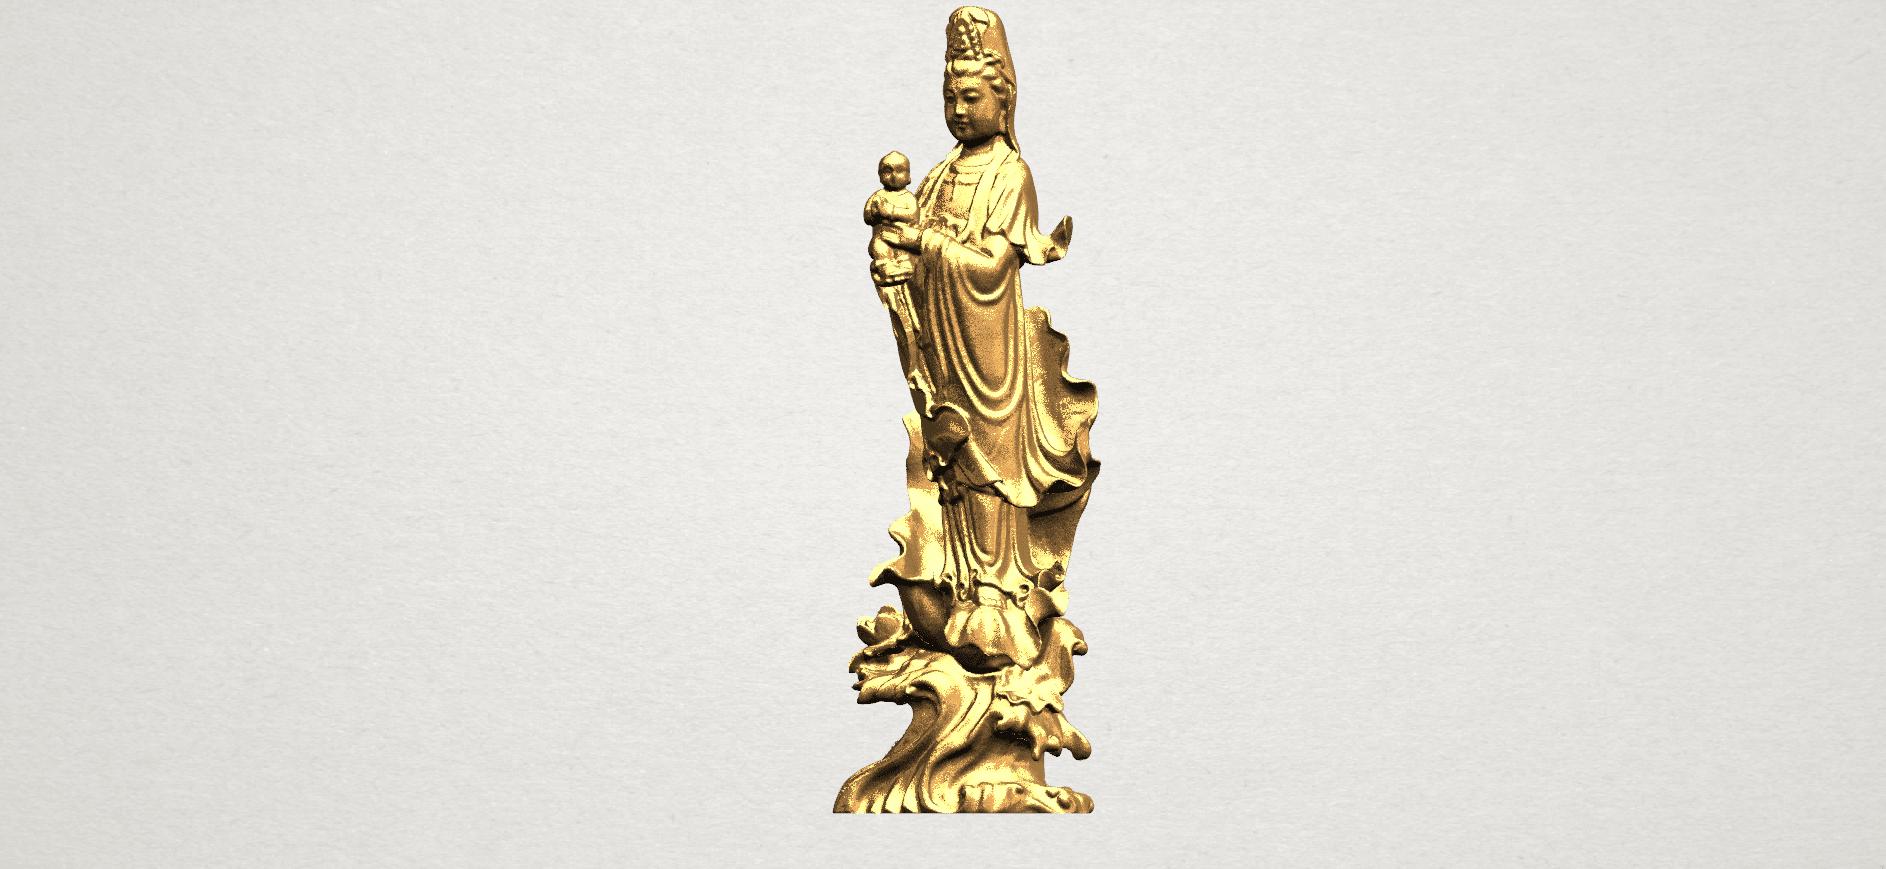 Avalokitesvara Buddha  award kid (i) A02.png Download free STL file Avalokitesvara Bodhisattva - award kid 01 • 3D print object, GeorgesNikkei